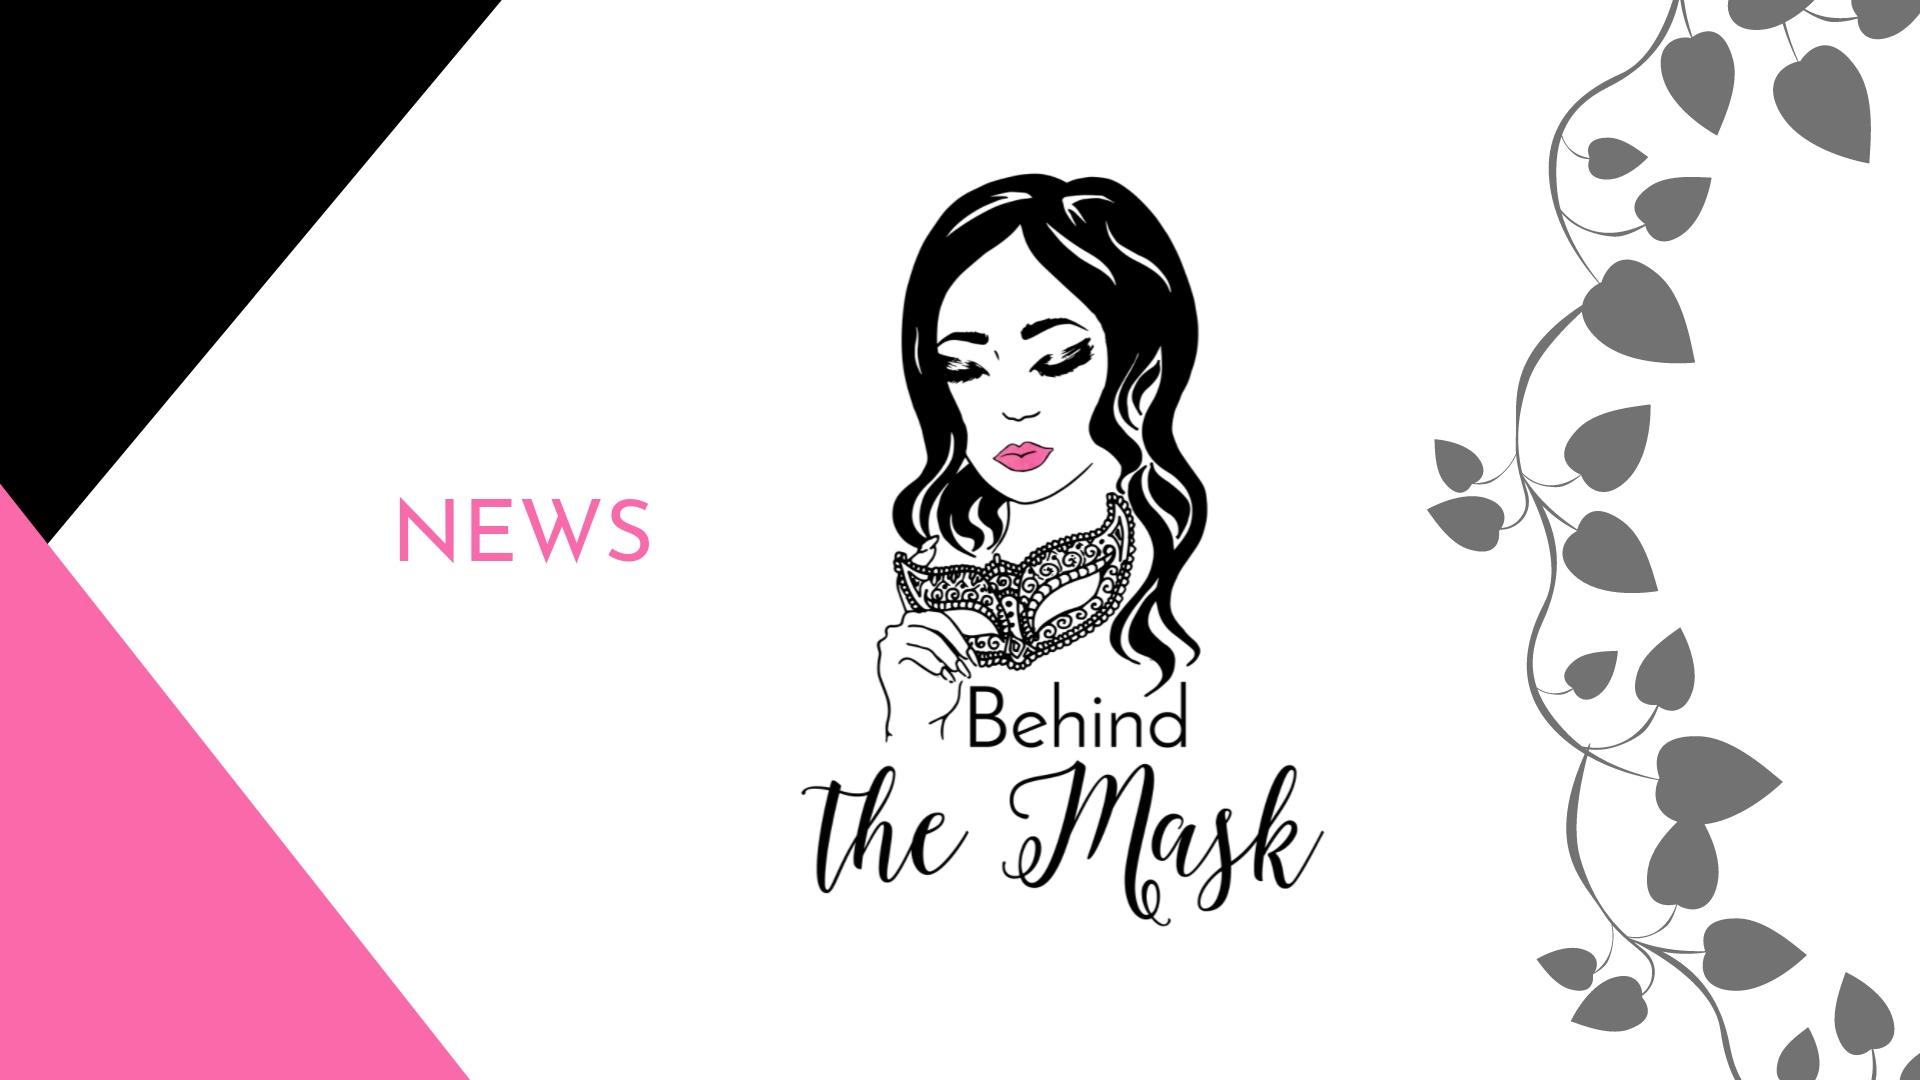 BehindTheMask-News